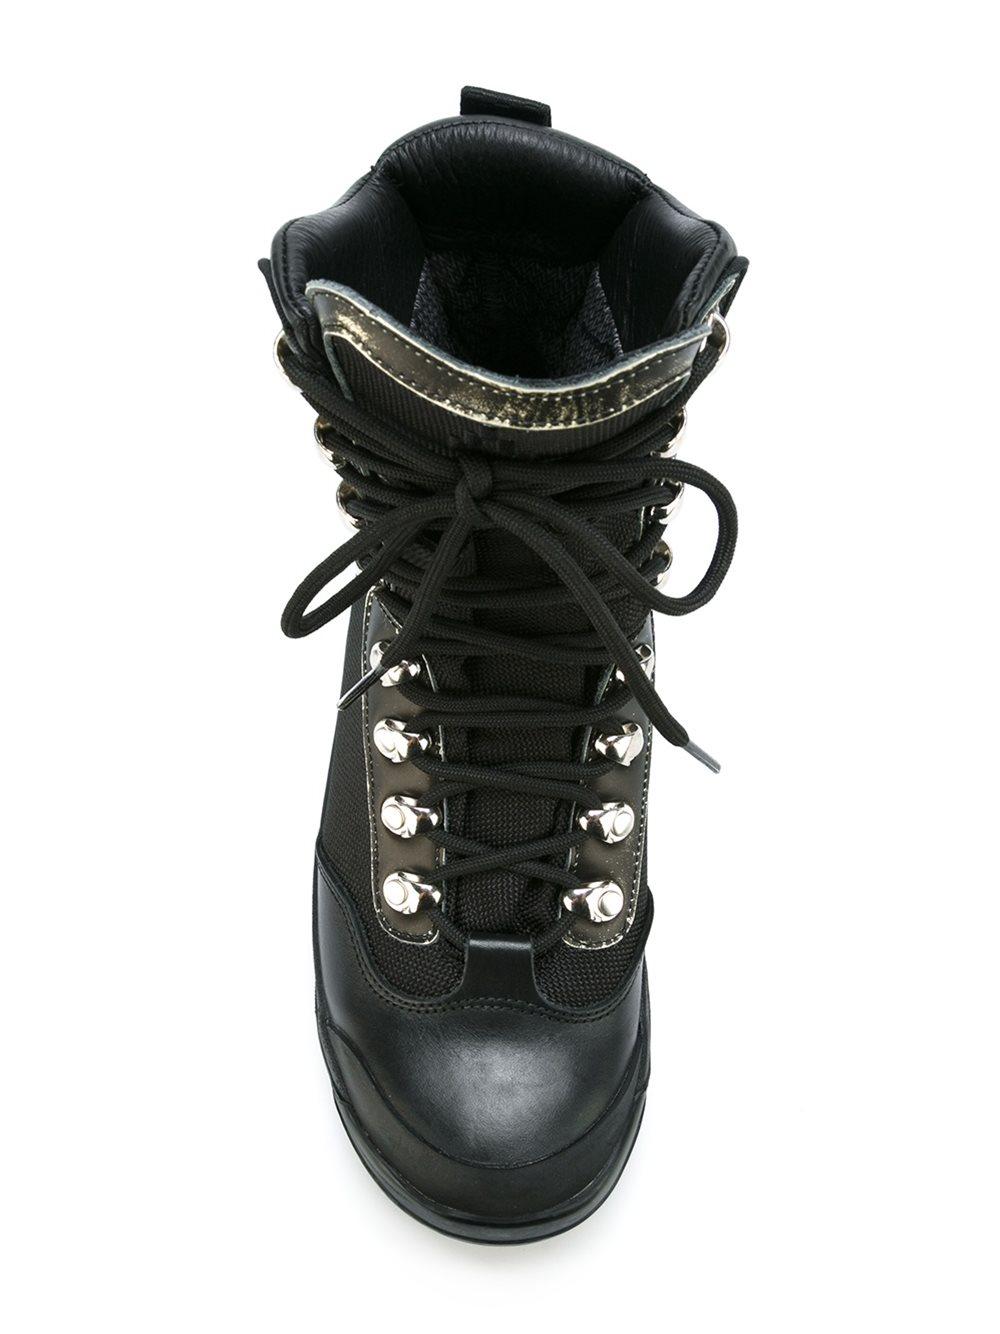 Marcelo Burlon Man hiking boots